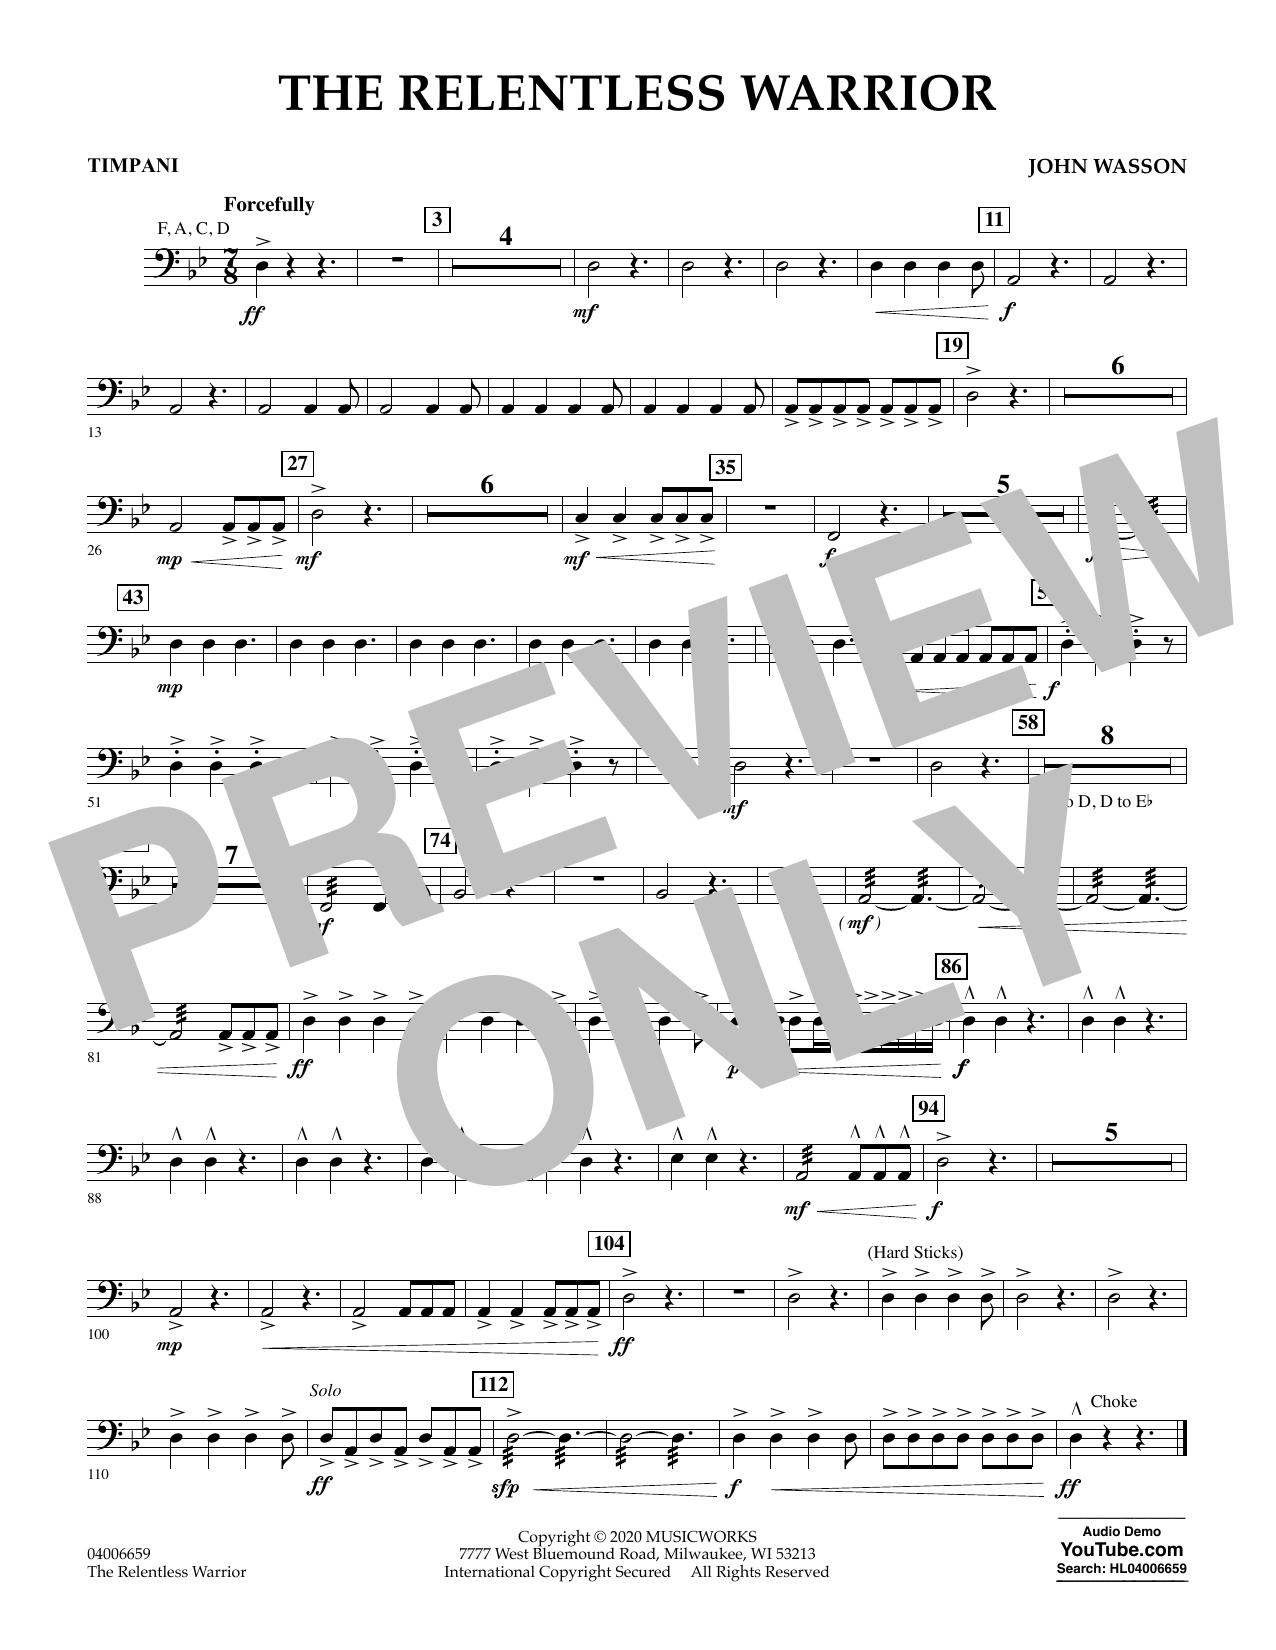 John Wasson The Relentless Warrior - Timpani sheet music notes and chords. Download Printable PDF.